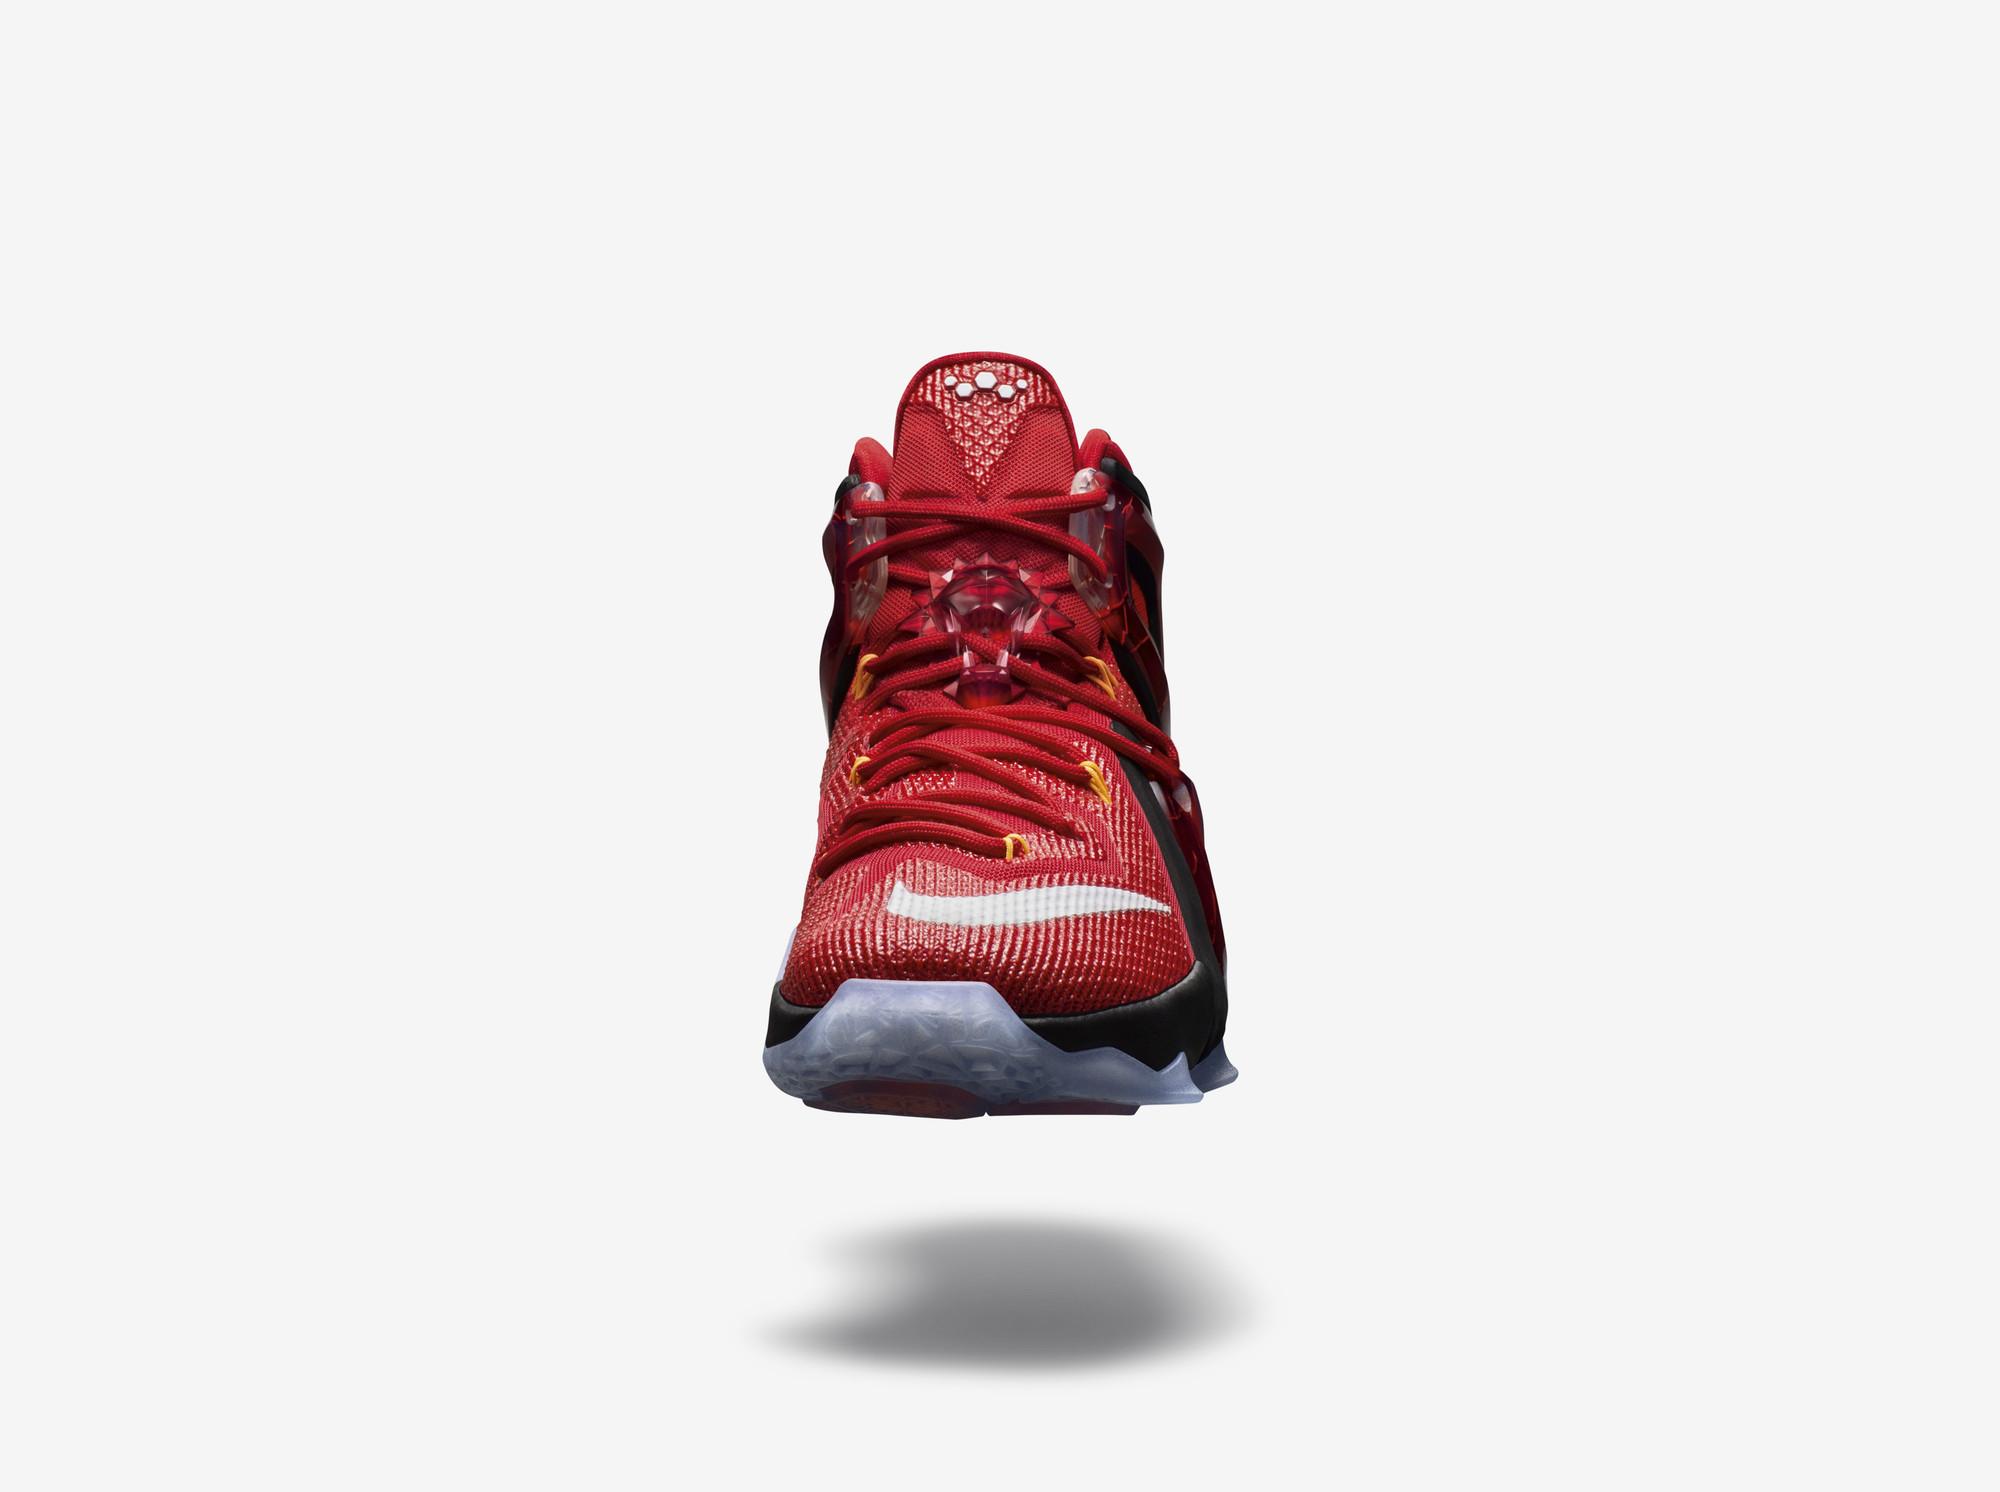 46b0b1c86f9c Nike LeBron XIV 14 White Wine Cavs Team Red Camo Gum Light Brown 852405-104